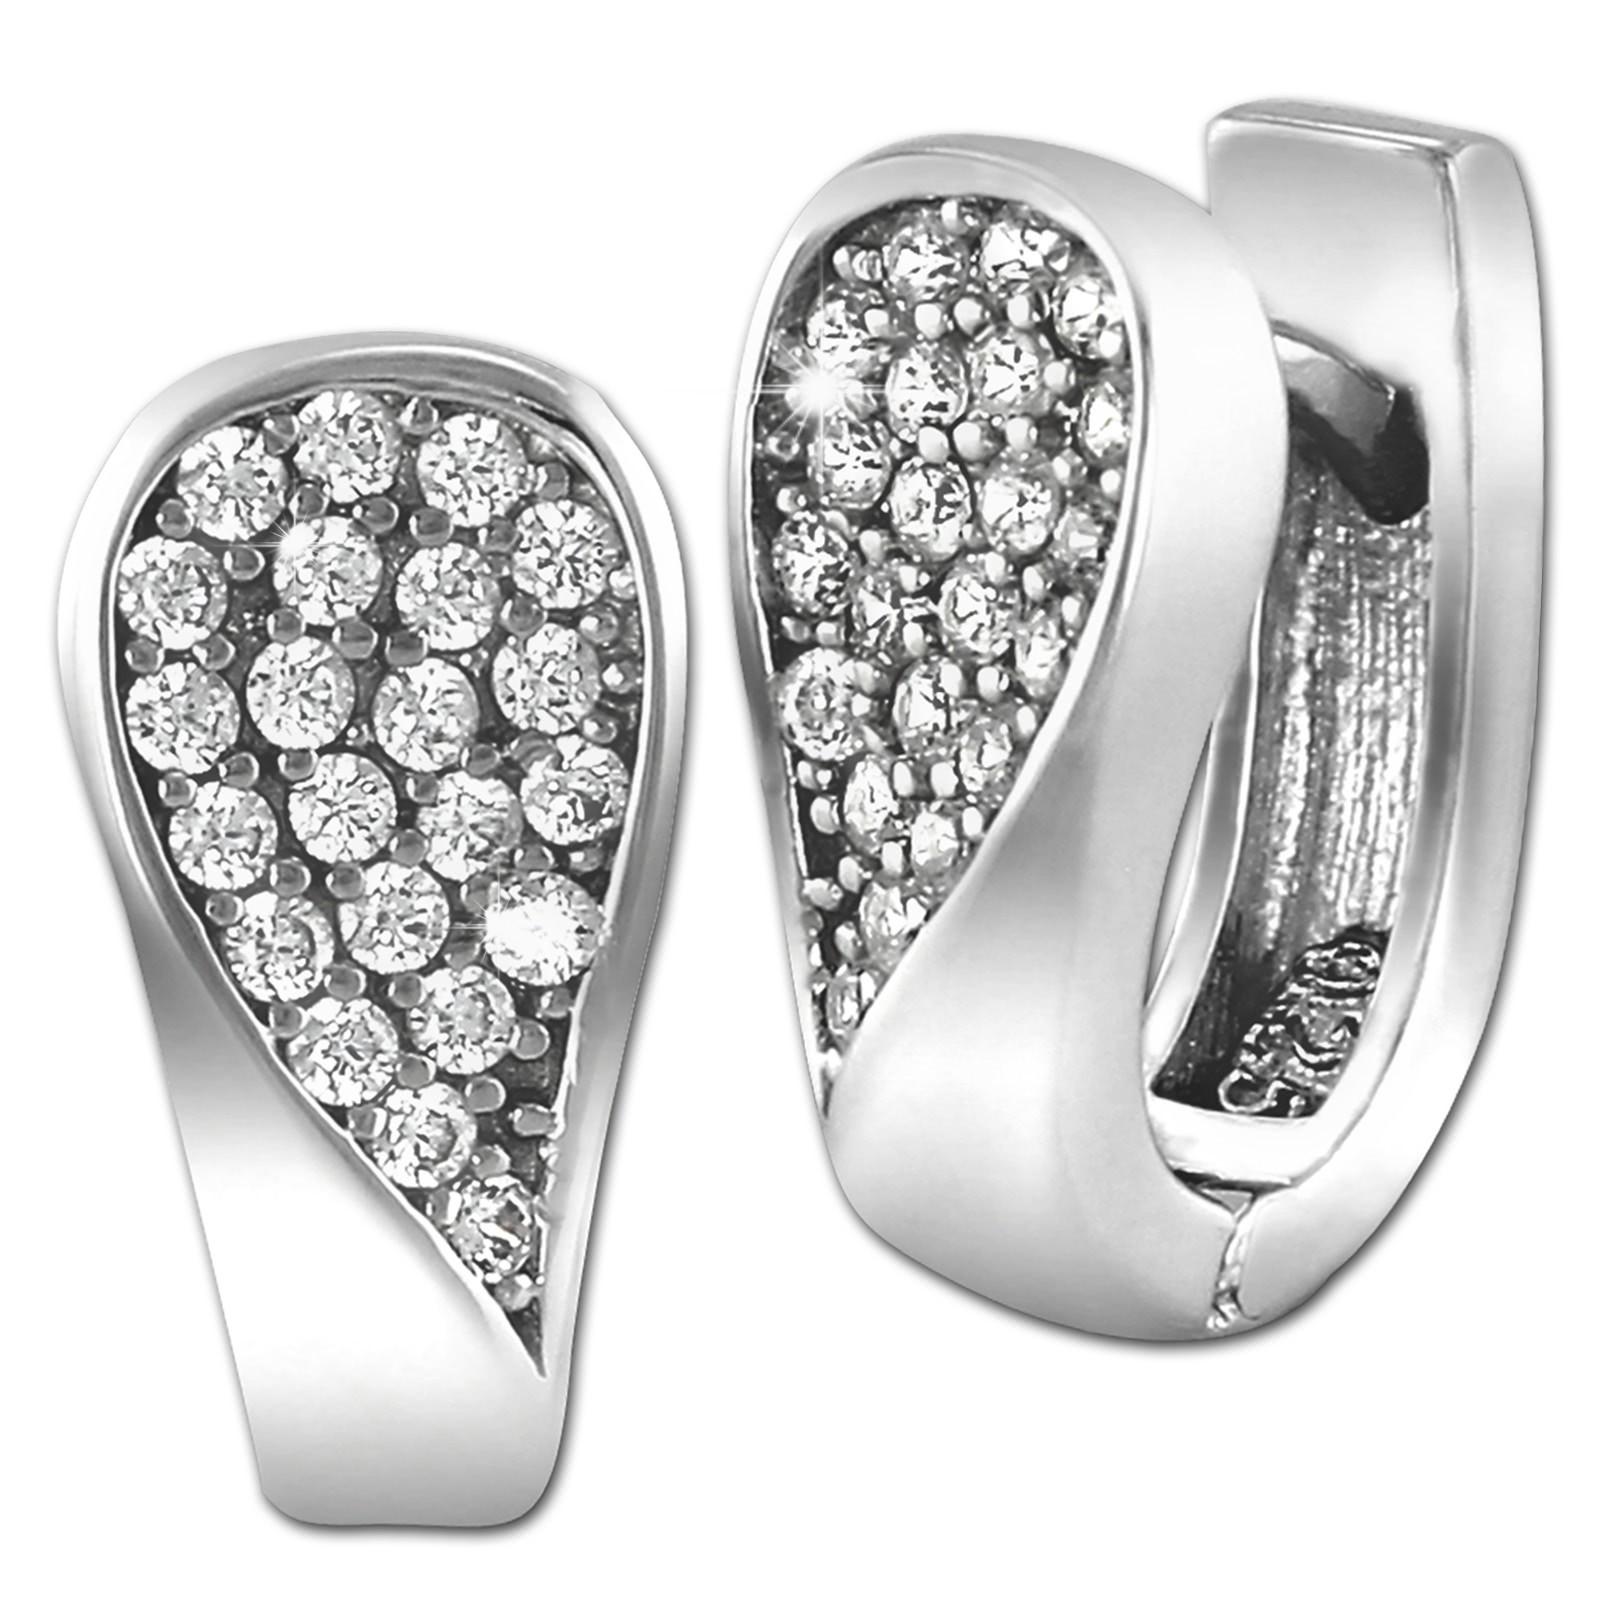 SilberDream Creole Glamour Zirkonia weiß 925 Sterling Silber Damen SDO4327W